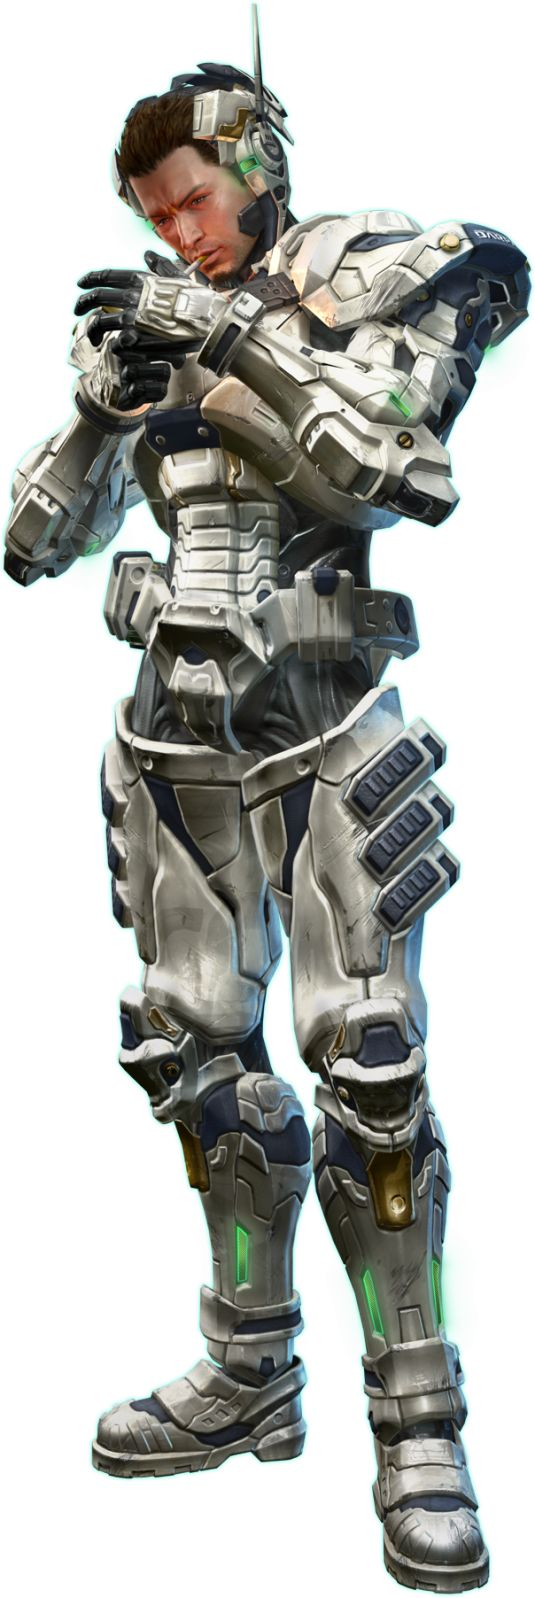 Vanquish armor | : concept art | Pinterest | Armors ...